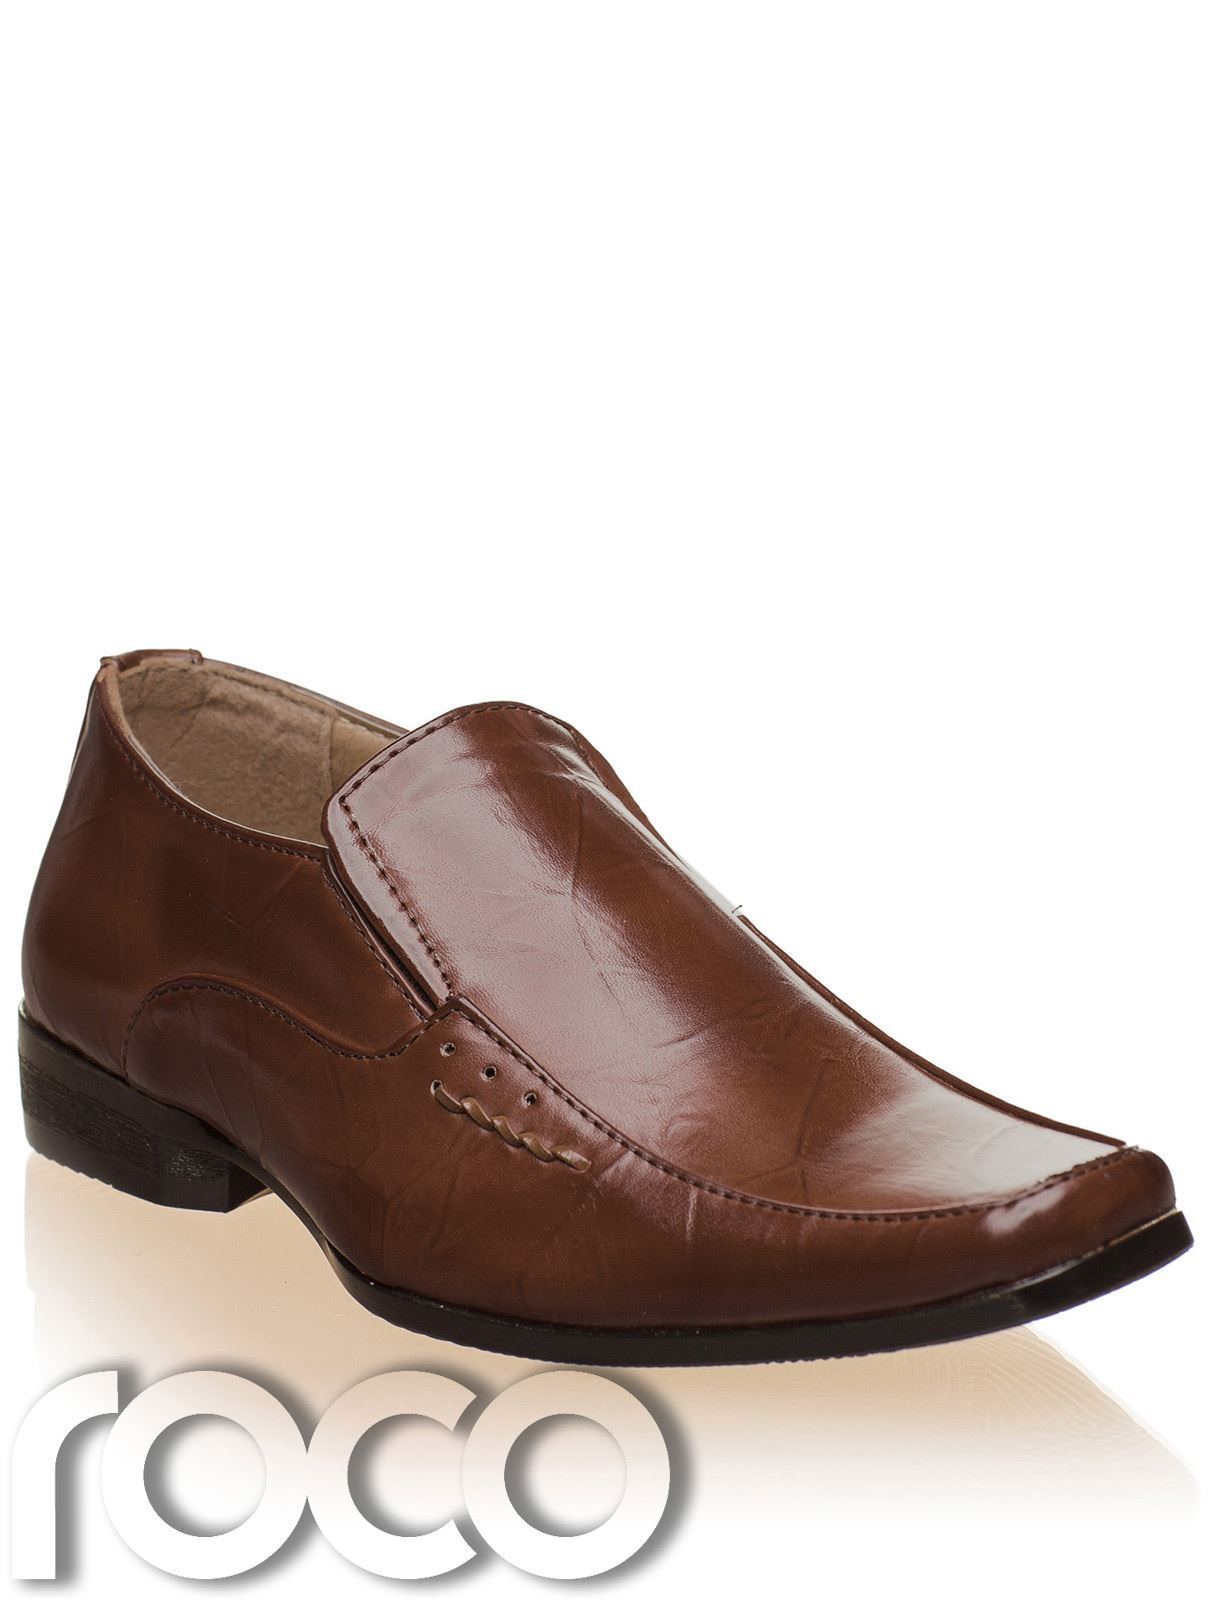 3ead90003 Boys Black Shoes, Boys Brown Shoes, Slip On Shoes, Boys Formal Shoes ...